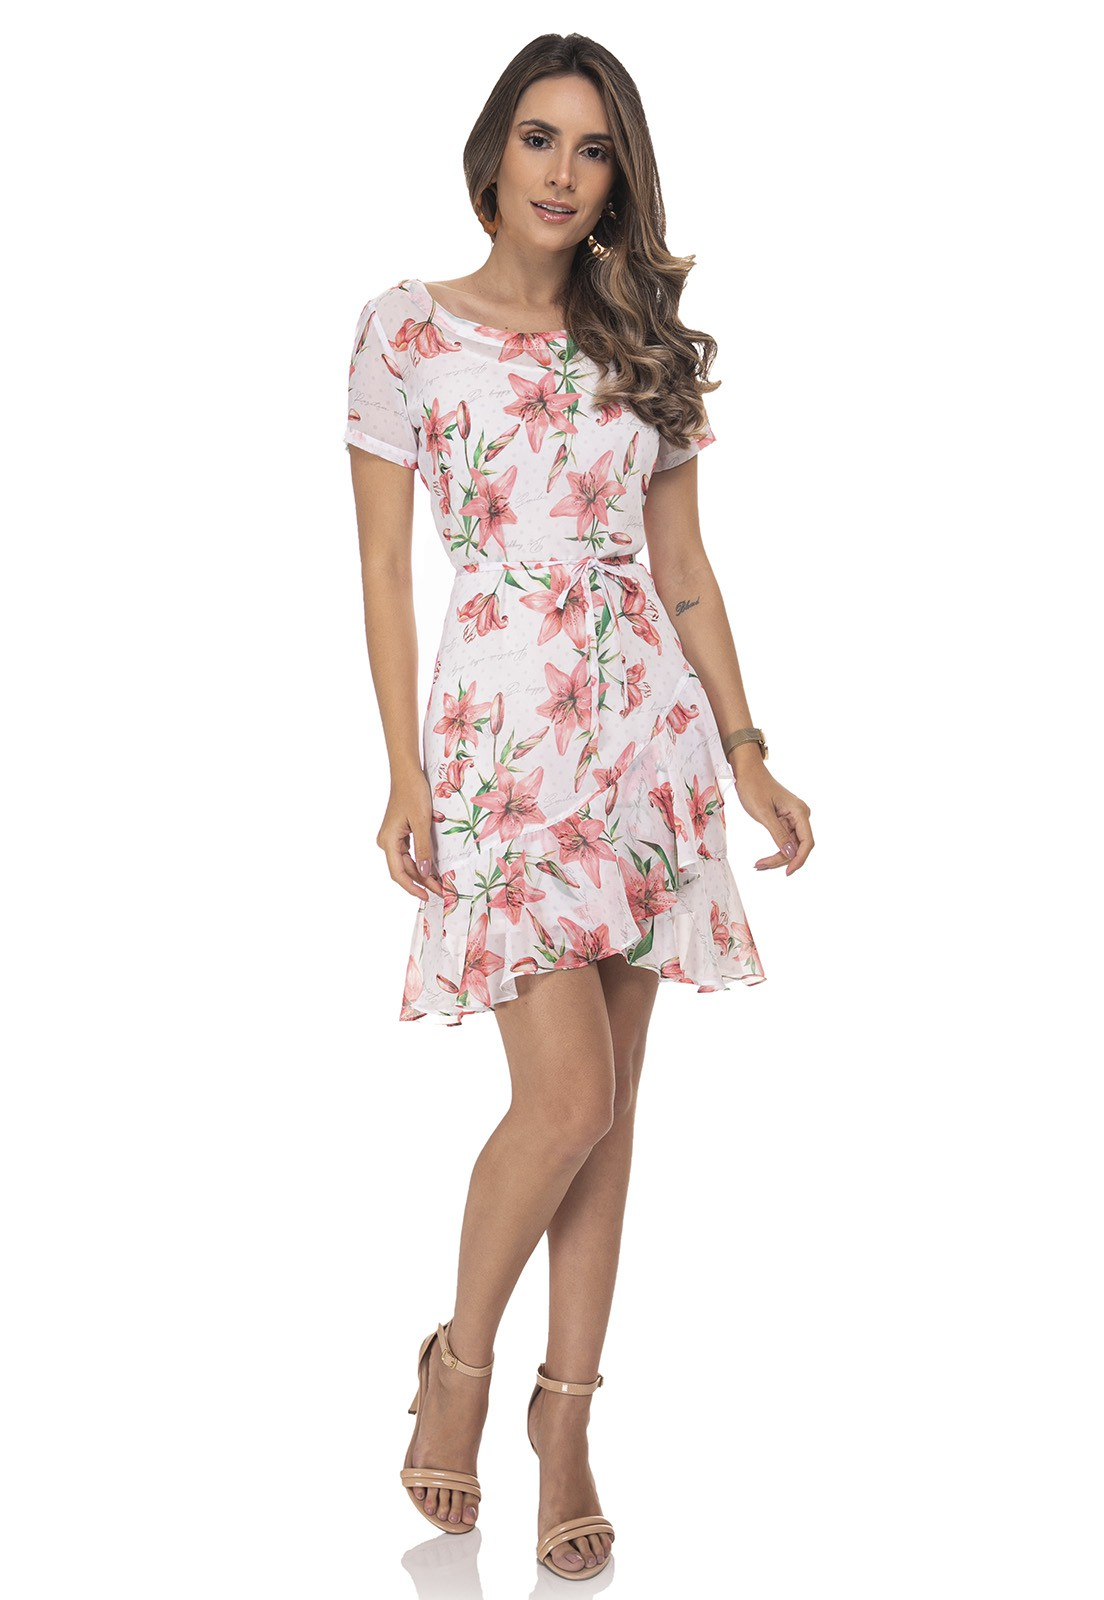 Vestido Chemise Evasê Transpassada Zaiko Estampada Floral Manga Curta 2427